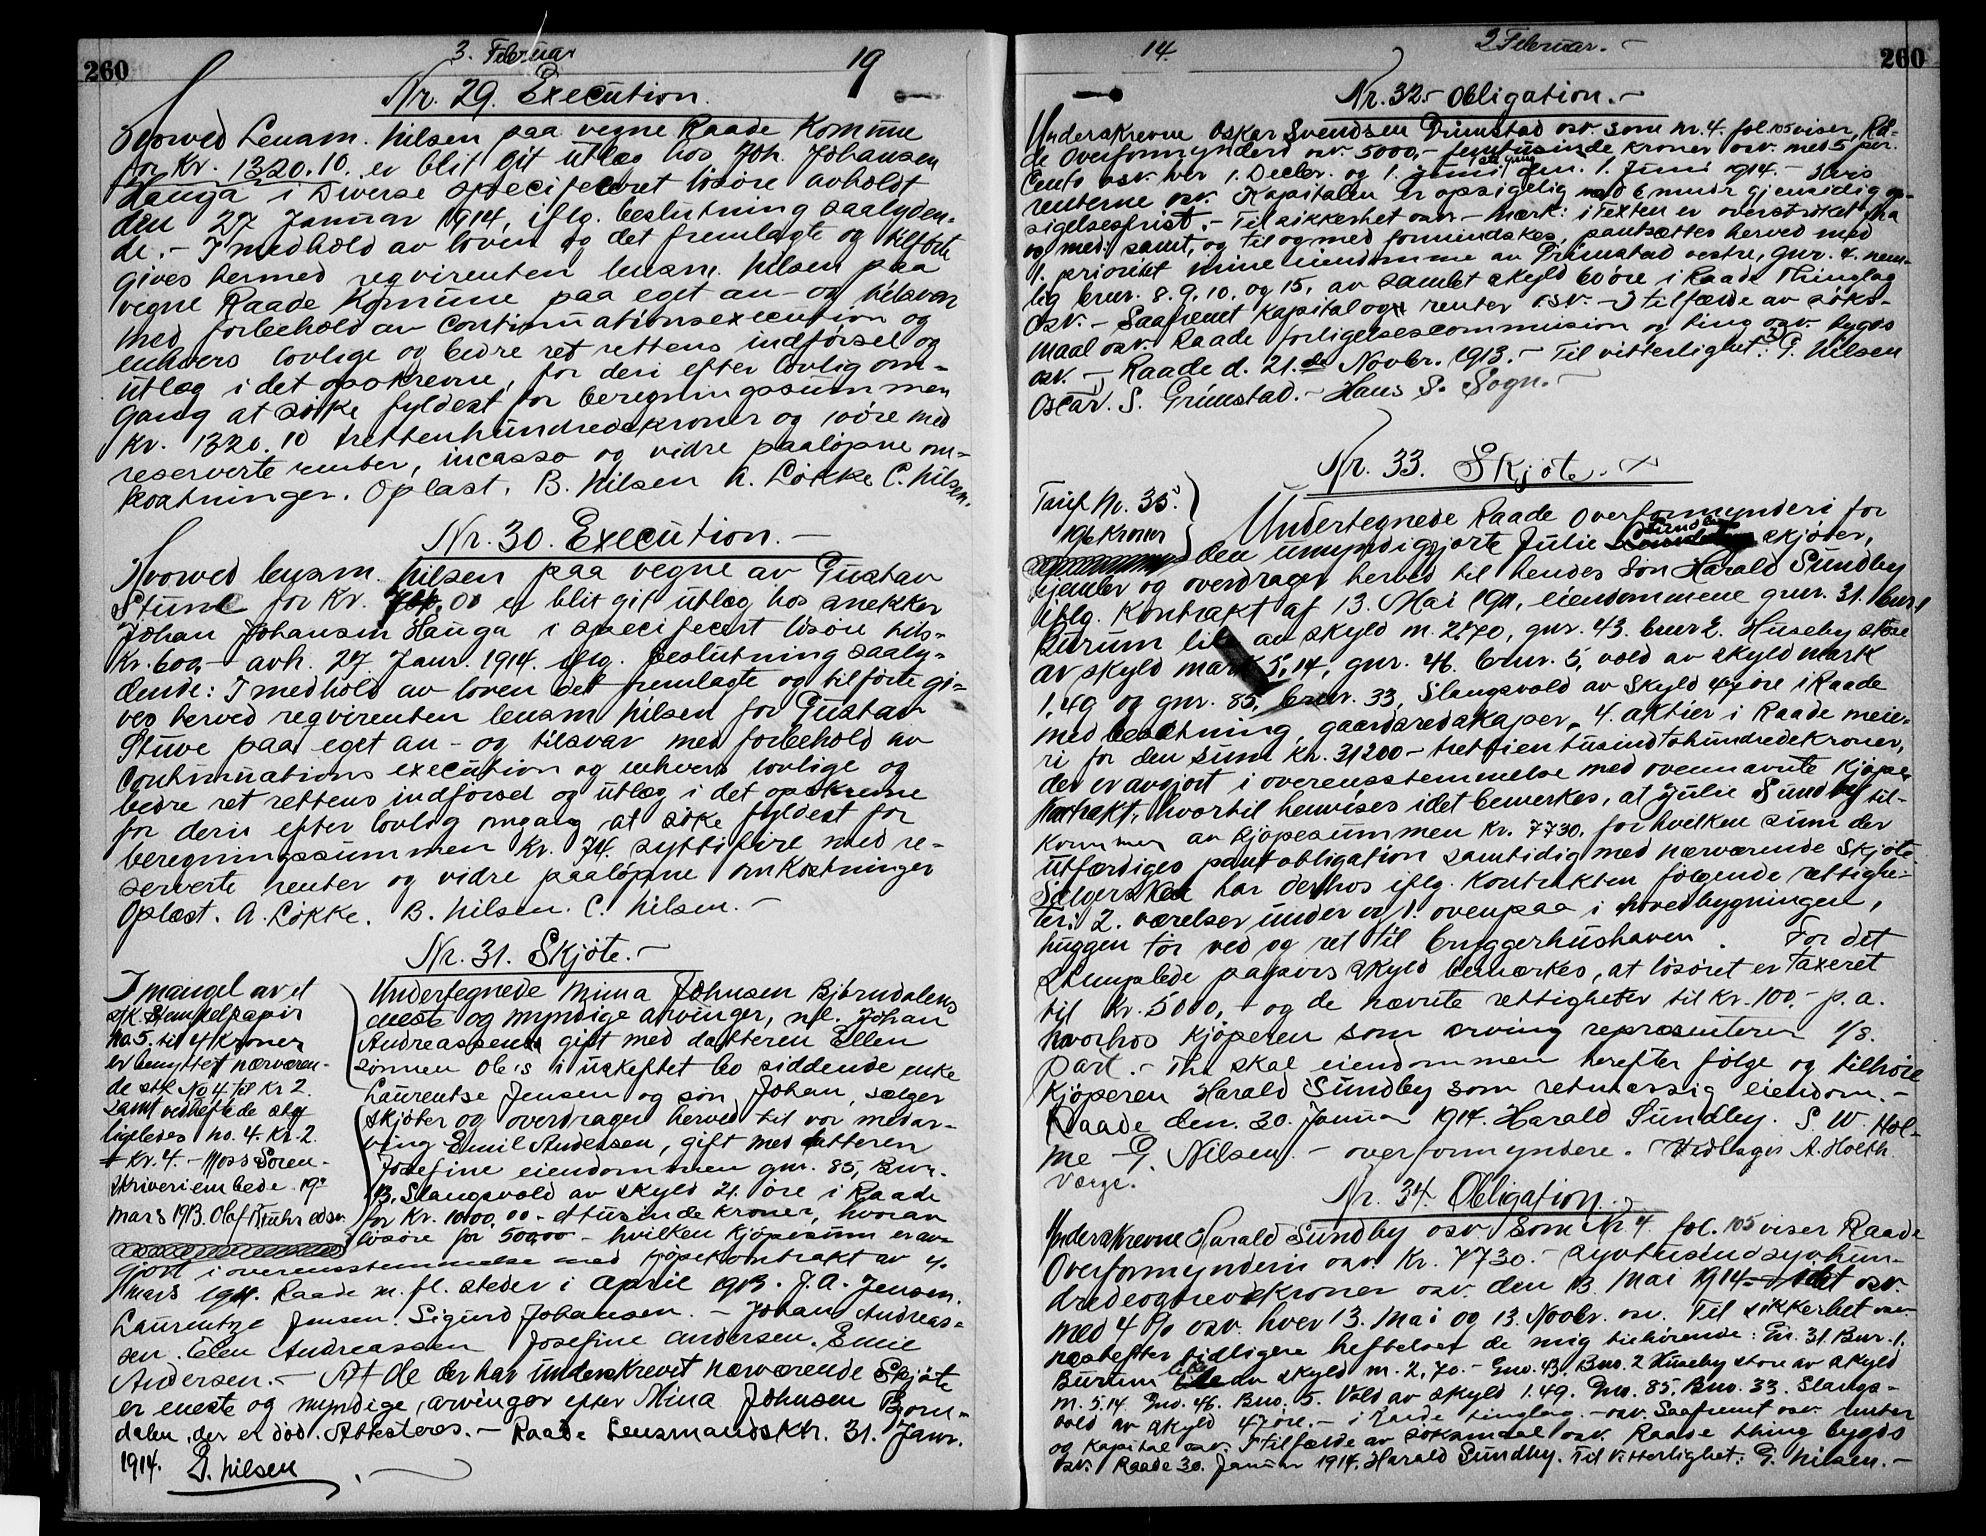 SAO, Moss sorenskriveri, Pantebok nr. 24, 1912-1915, s. 260